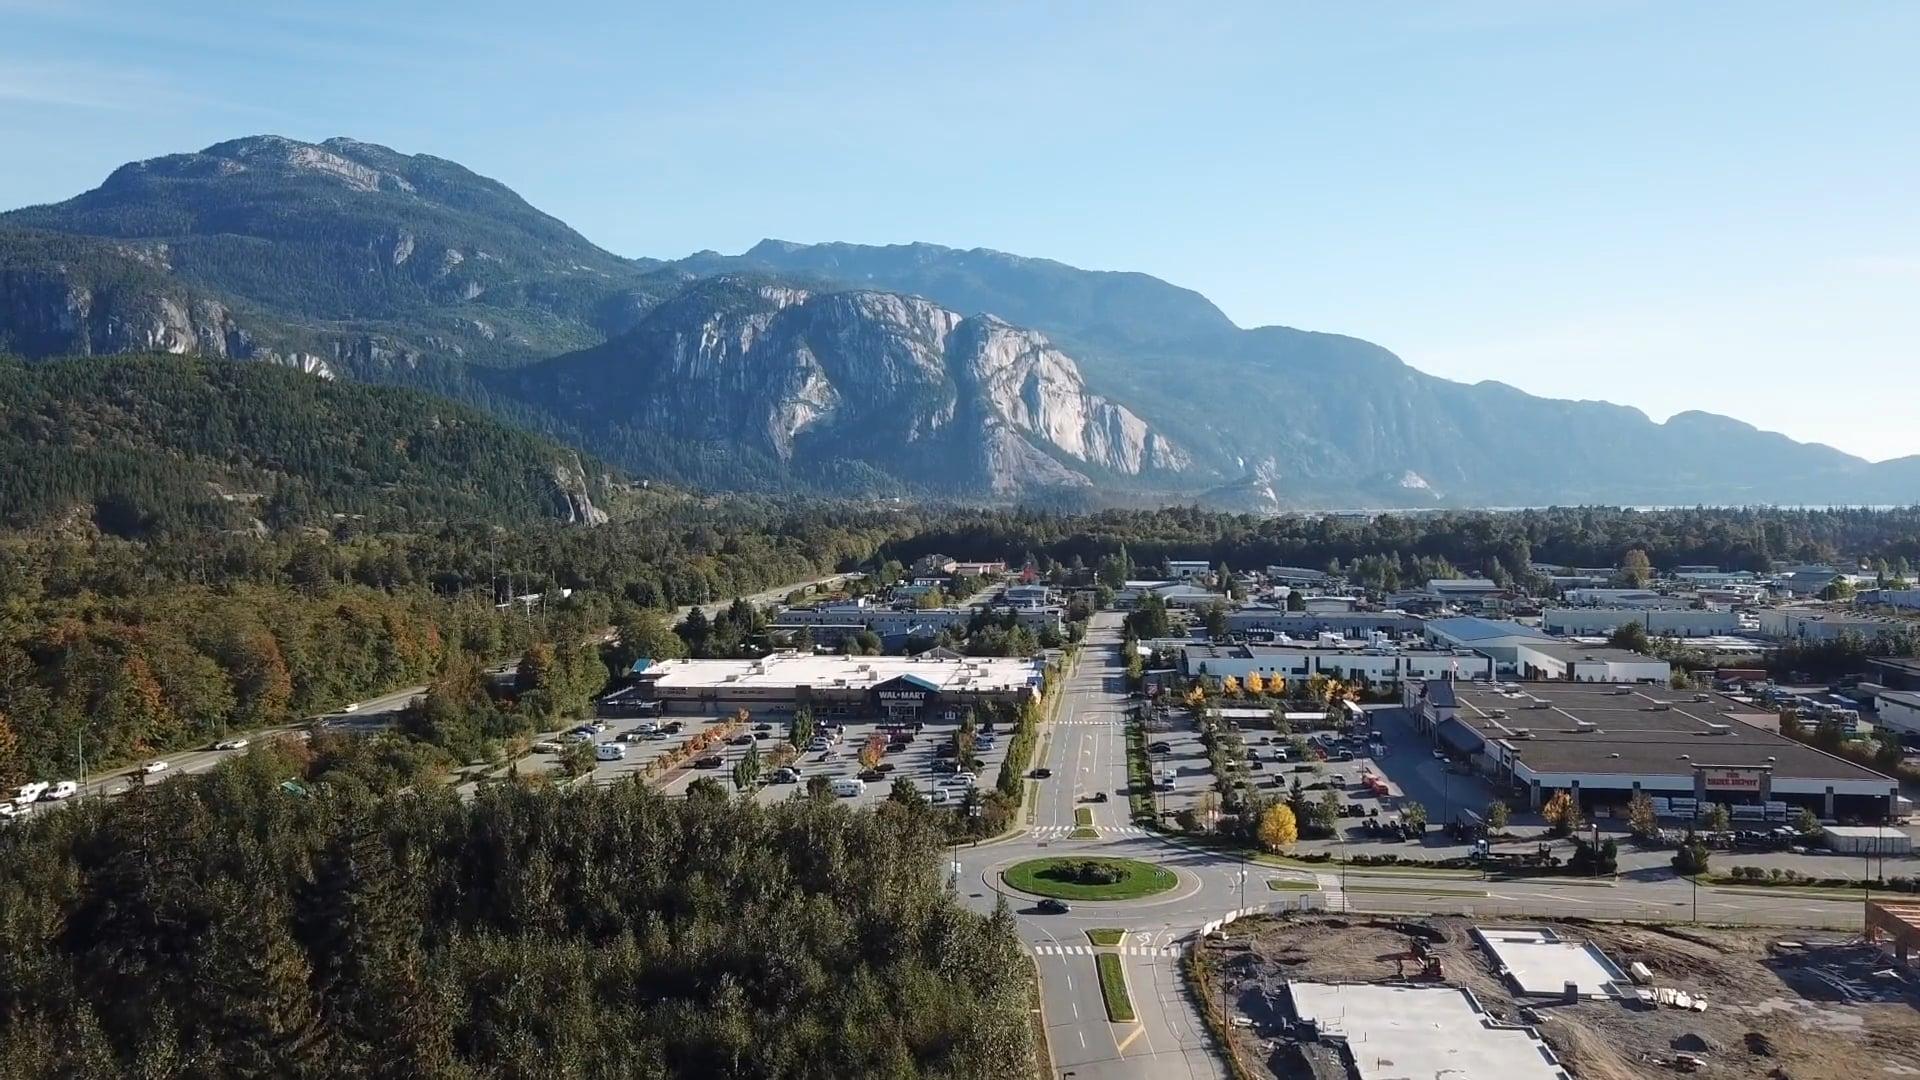 Squamish River Estuary, Garibaldi, SkyRidge, Stawamus Chief, Industrial Park (Ventana), Garibaldi, Squamish, British Columbia